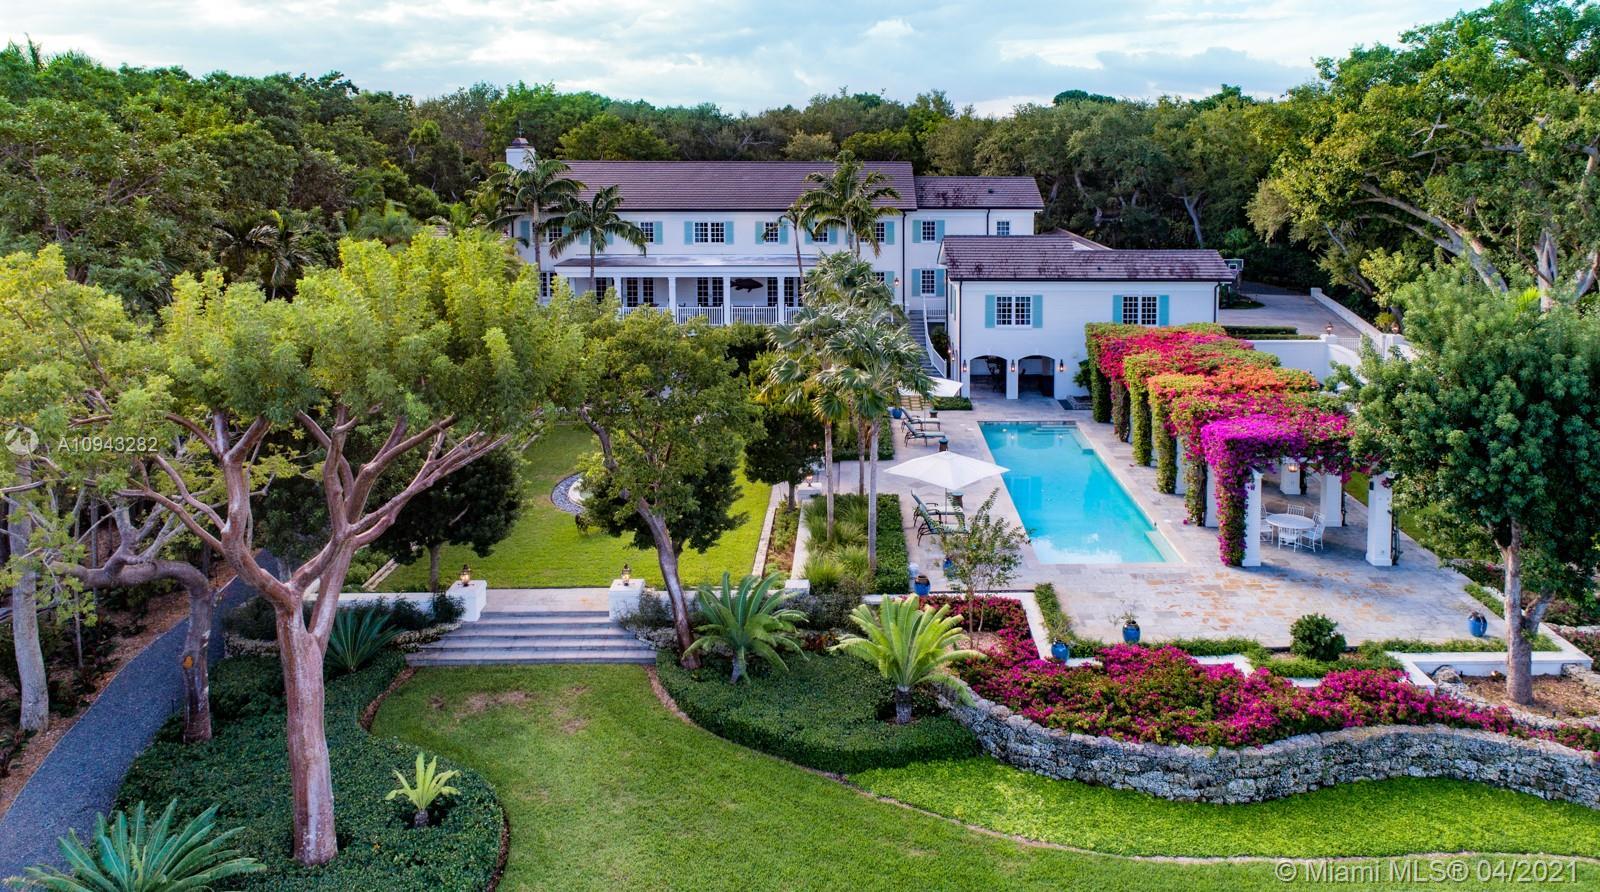 Real Estate Photo A10943282